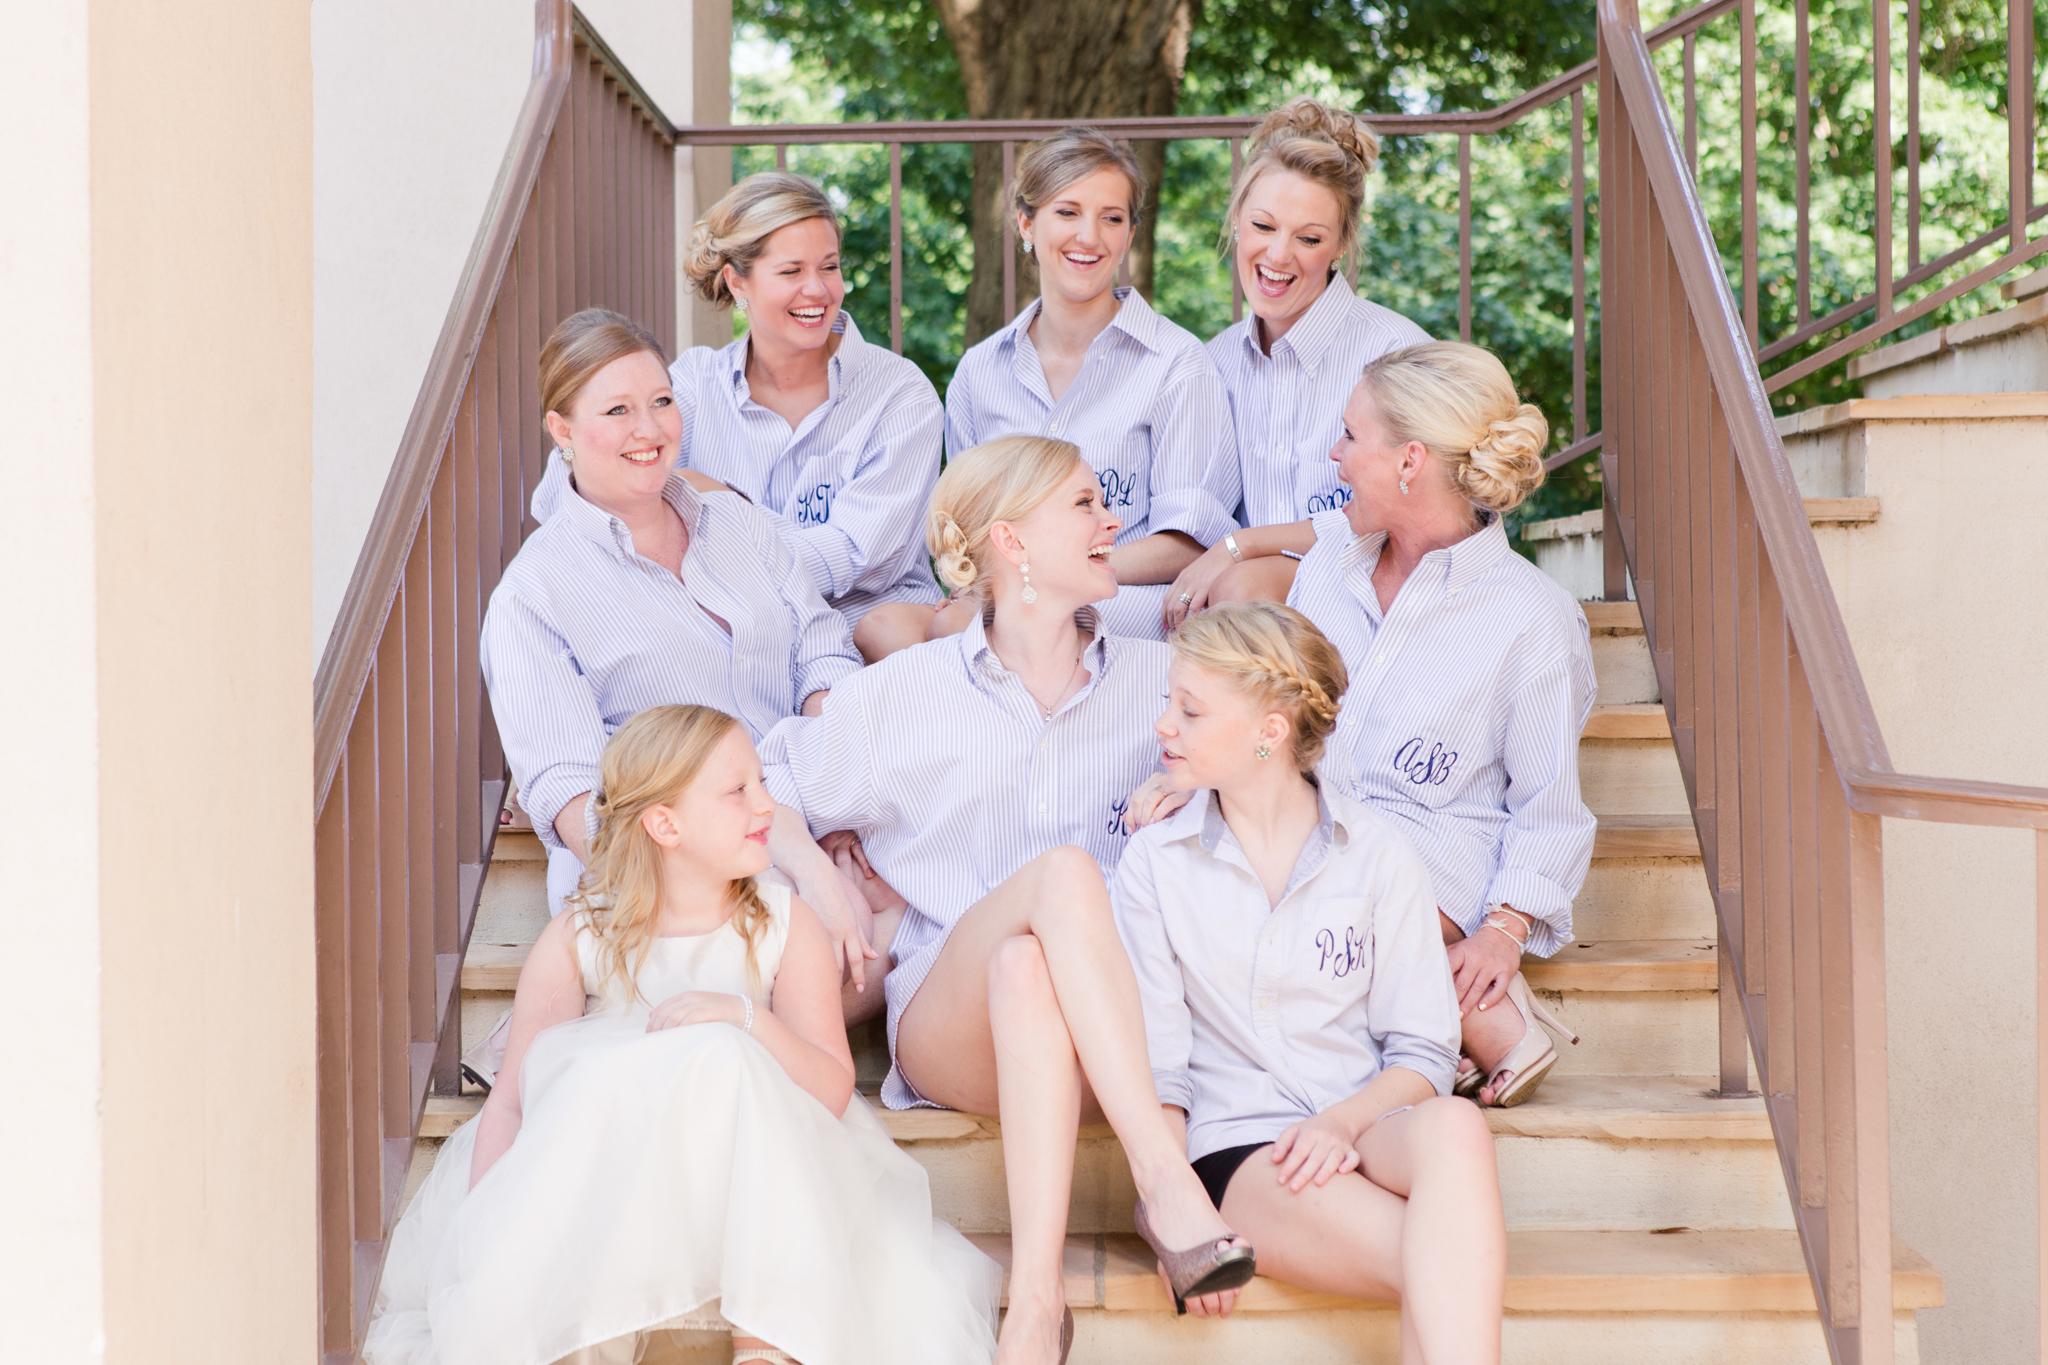 Ashley-Amber-Photo-Candid-Wedding-Photography-160430.jpg